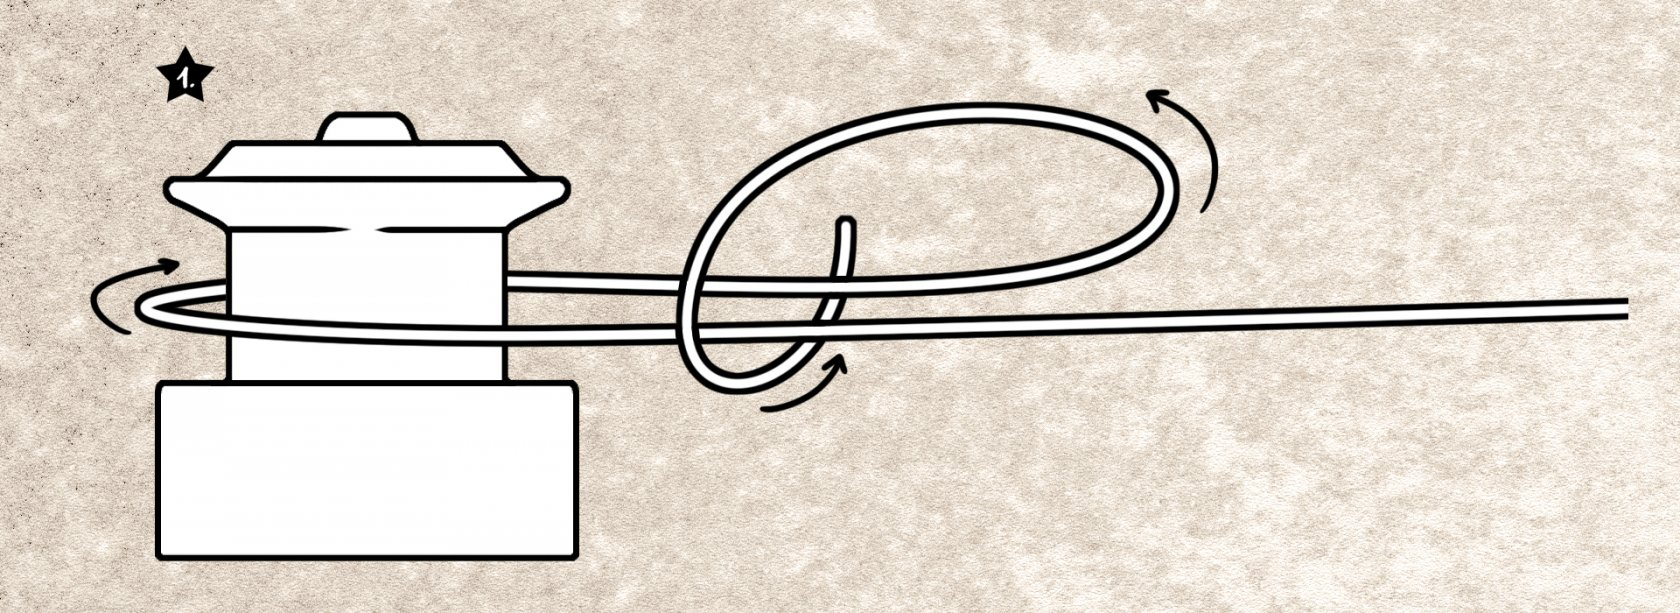 Uni-Knot als Spulenachsenknoten